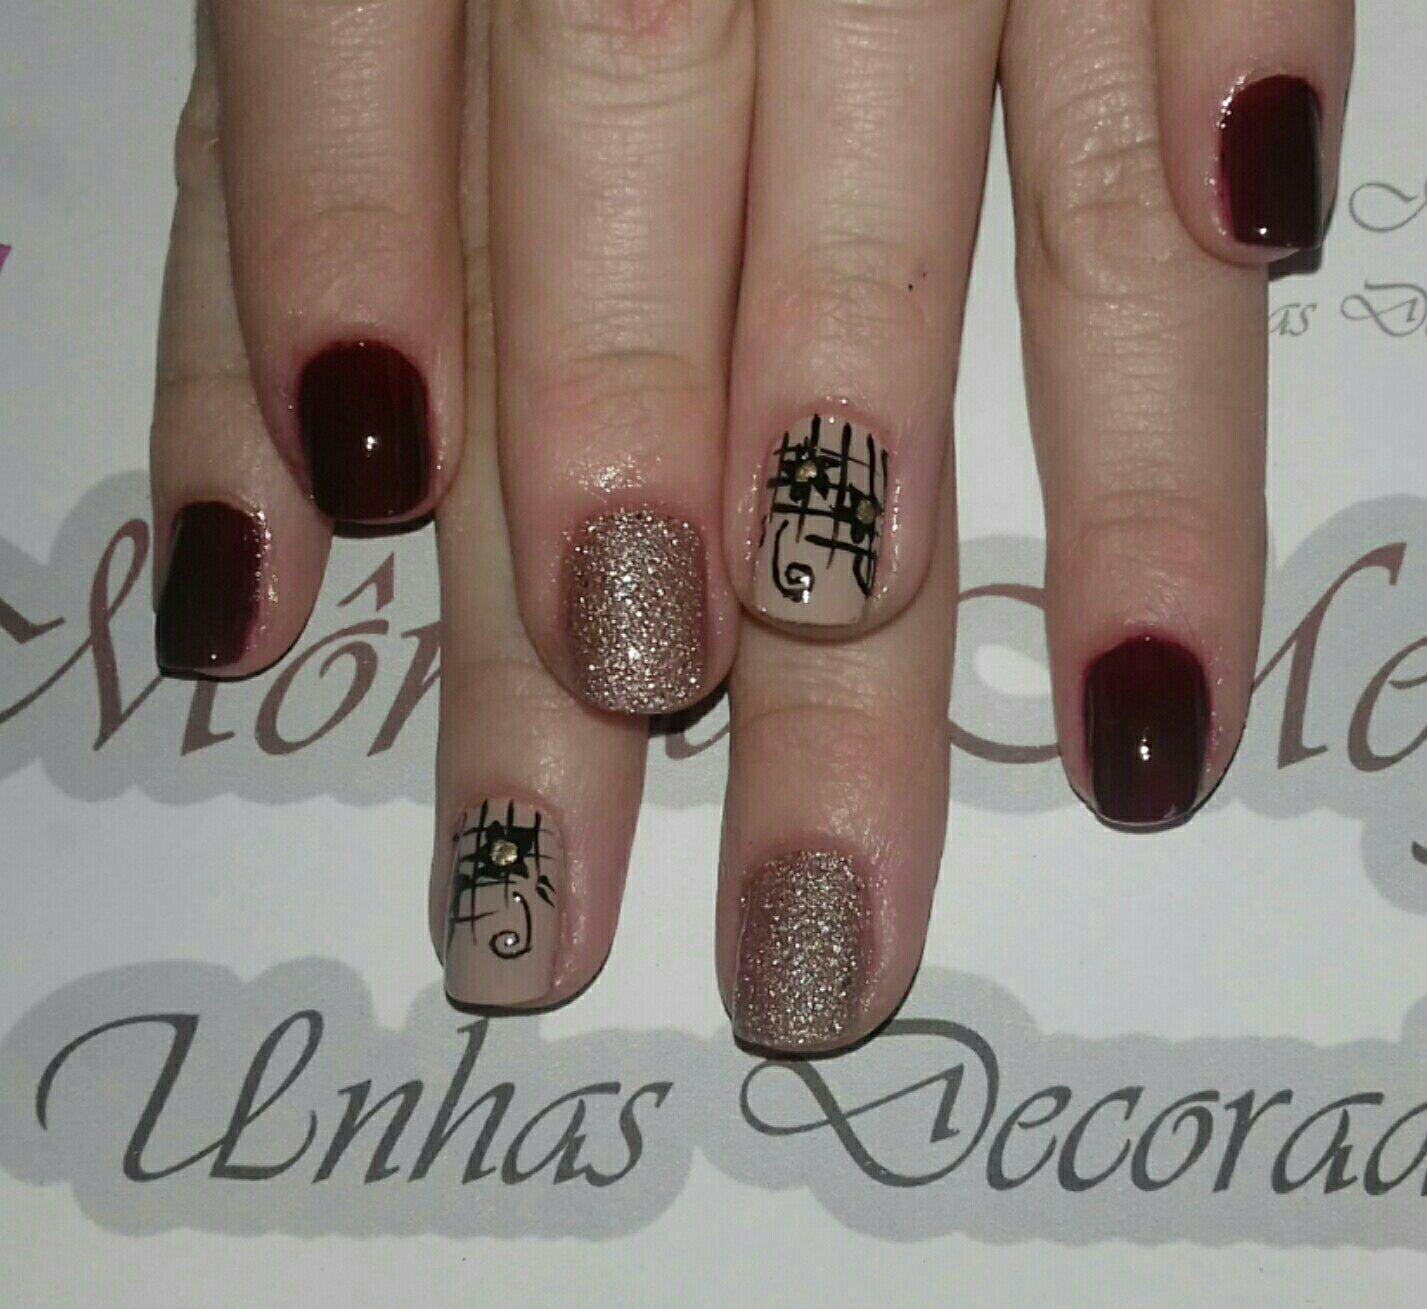 Avon Crystal. Desenho artesanal. unha manicure e pedicure manicure e pedicure